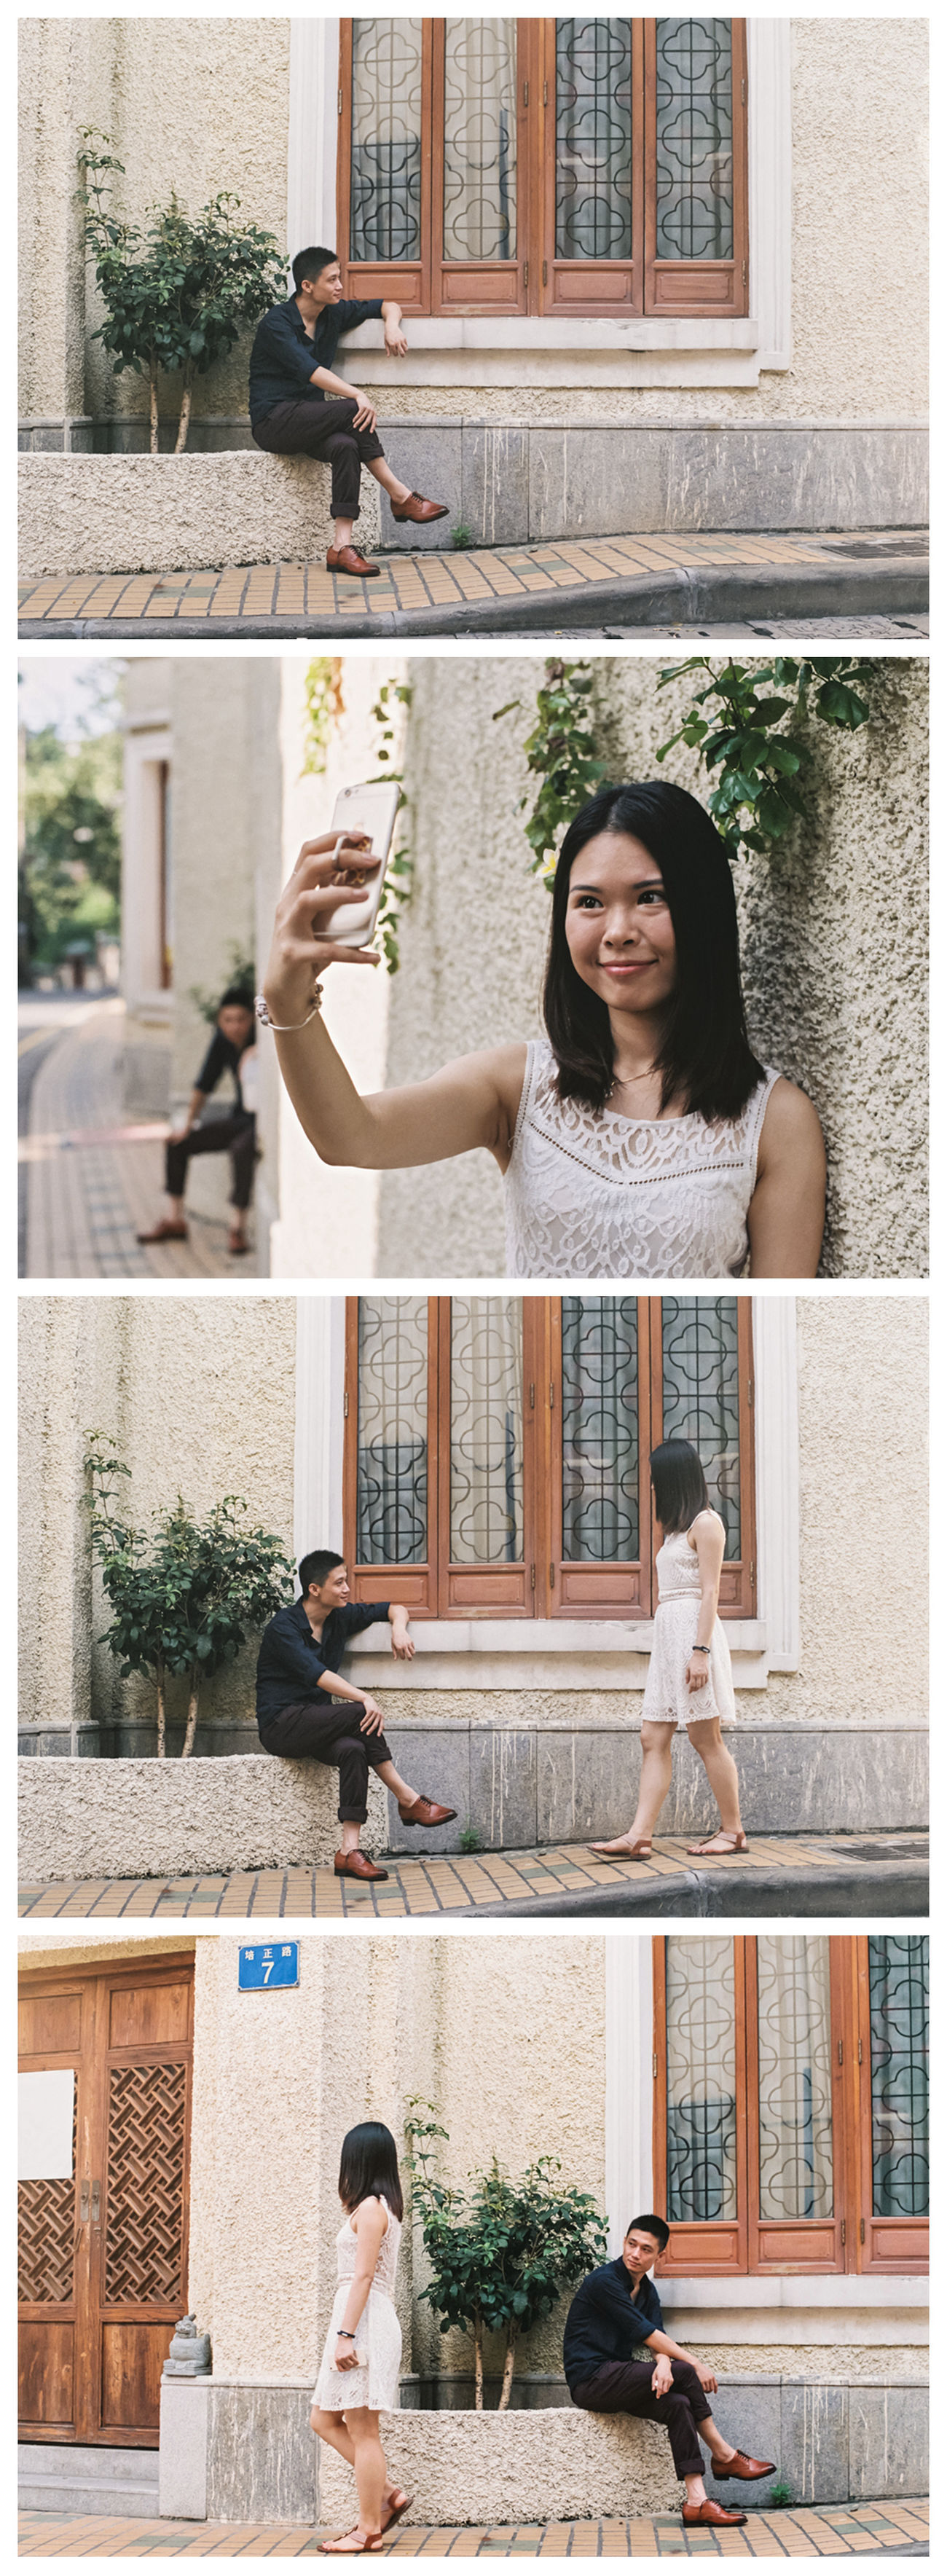 What I Value Love Couple 135film 135mm Pentax Pentax MZ-S